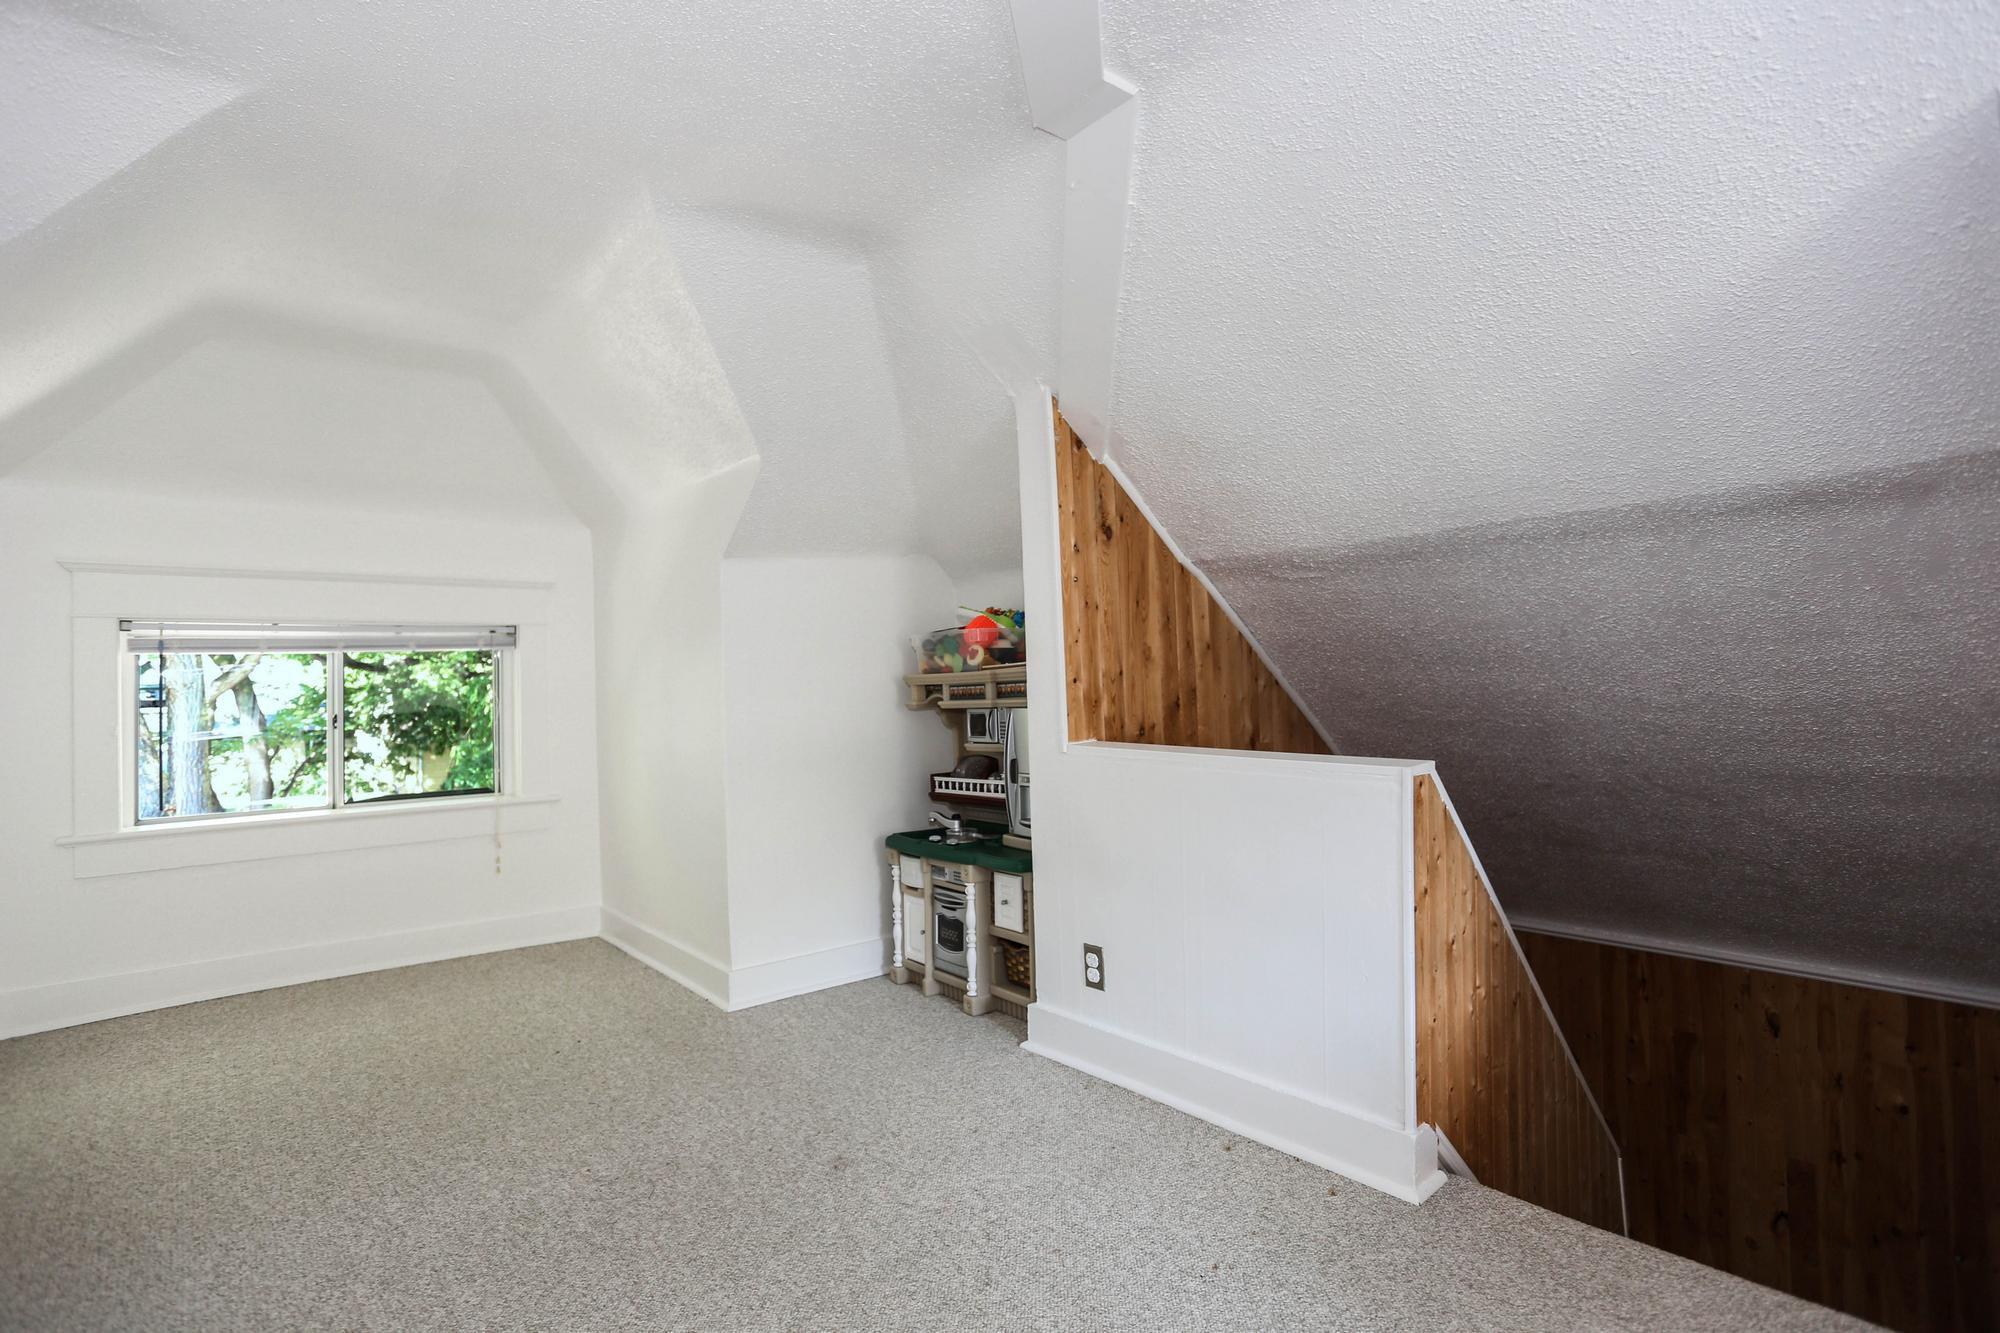 Photo 27: Photos: 105 Evanson Street in Winnipeg: Wolseley Single Family Detached for sale (5B)  : MLS®# 1821900